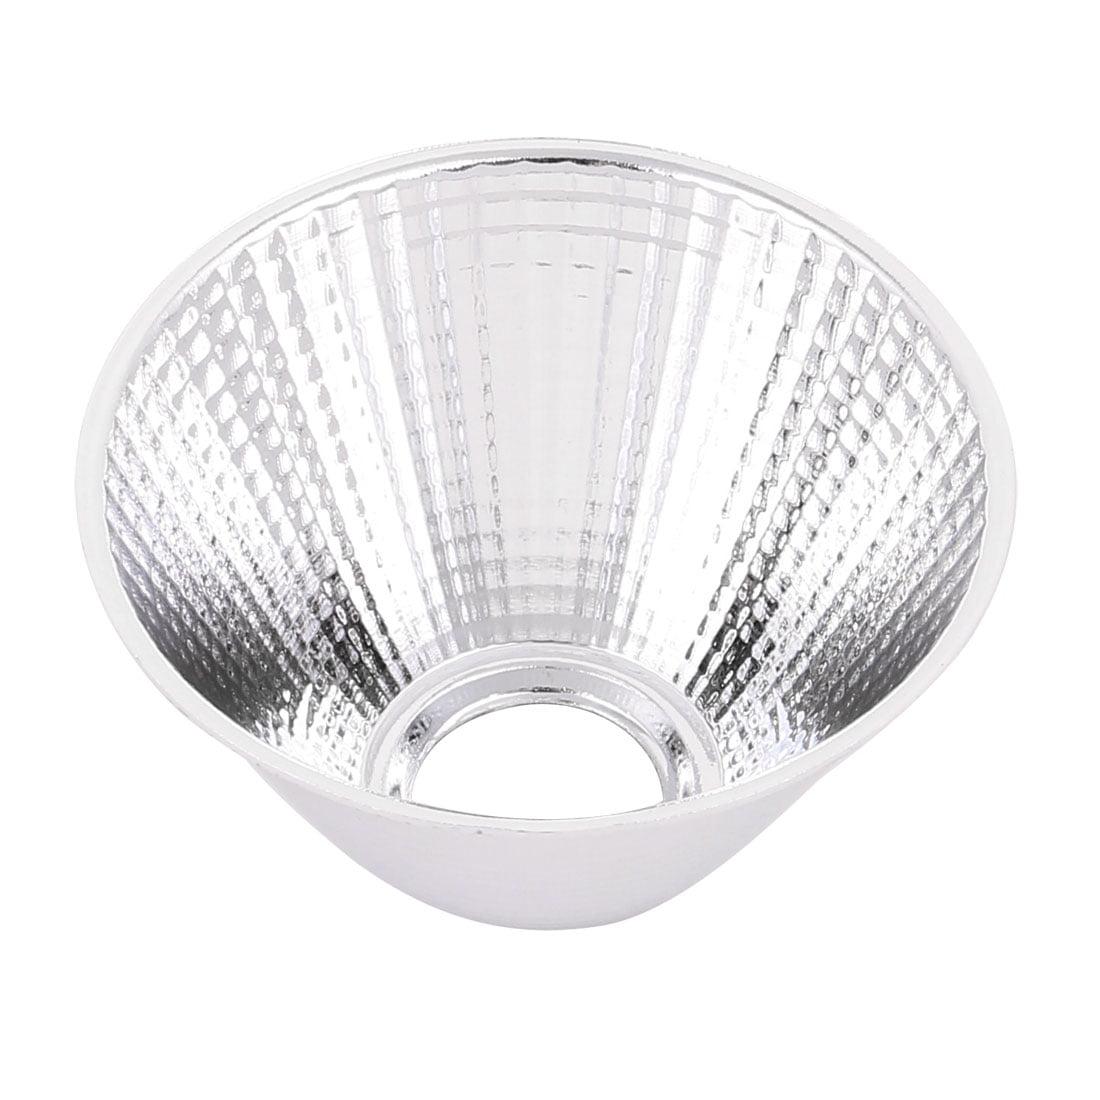 D69mm H40mm Aluminum LED Light Lamp Reflector Cup for LED COB Flashlight - image 2 de 2